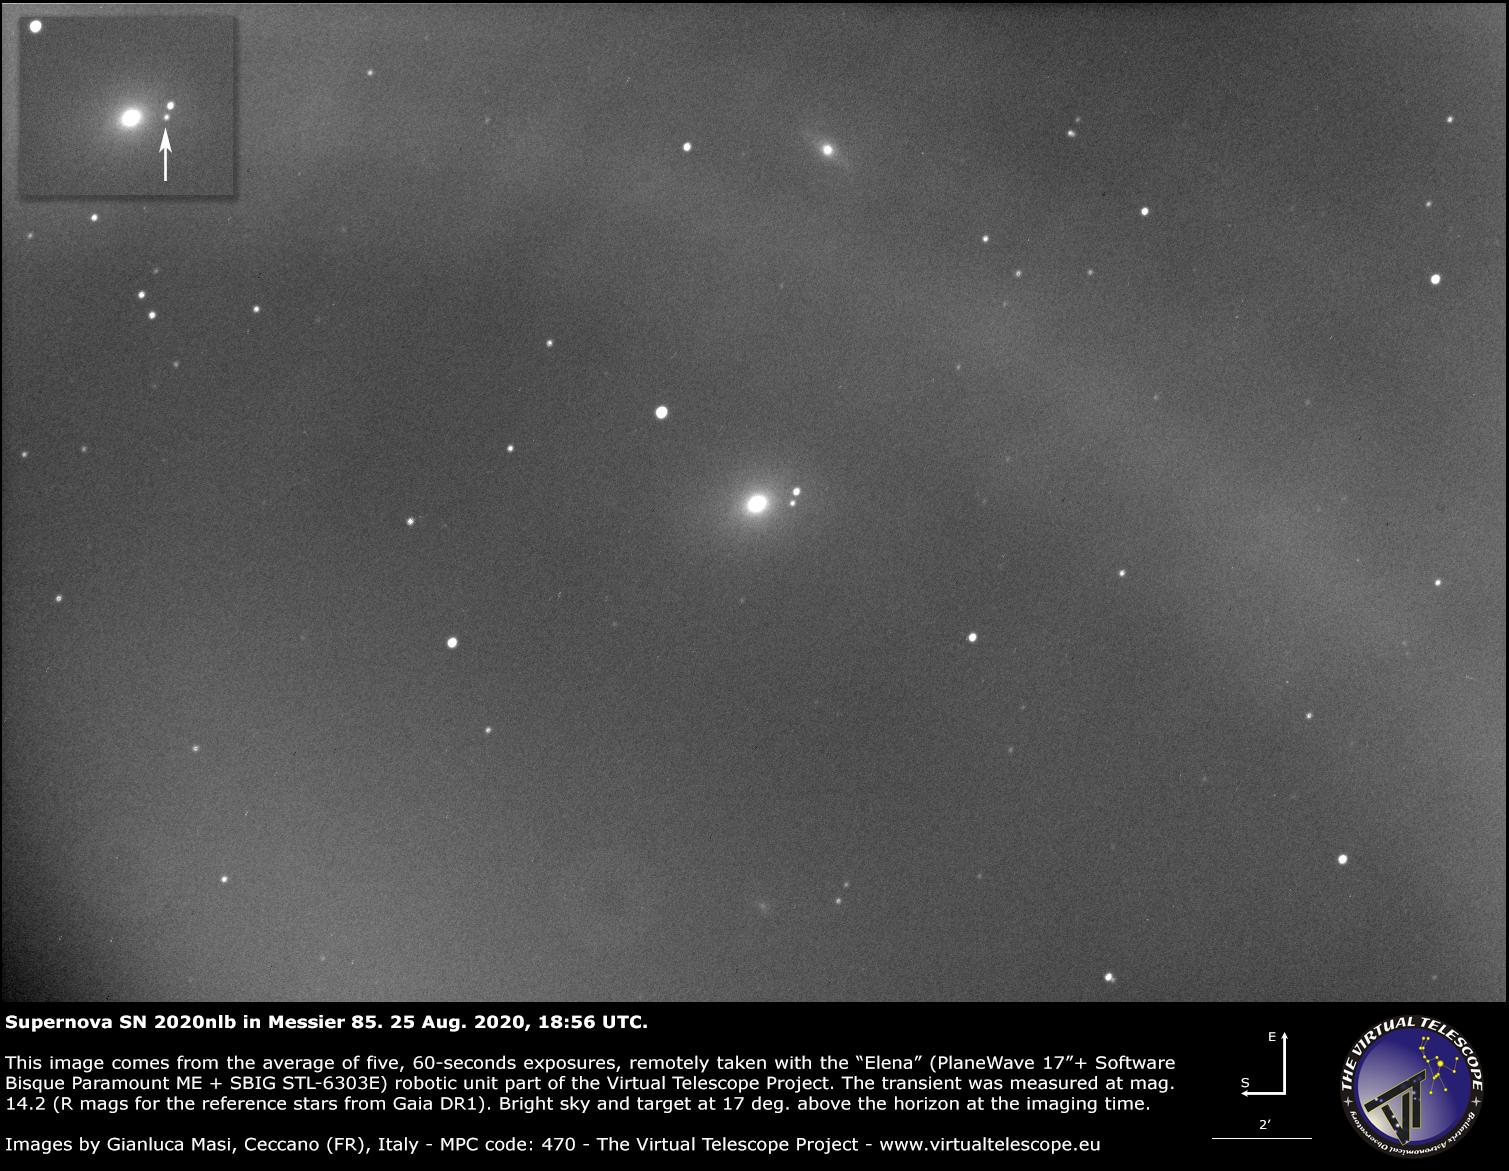 Supernova SN 2020nlb in Messier 85: an image - 25 Aug. 2020.